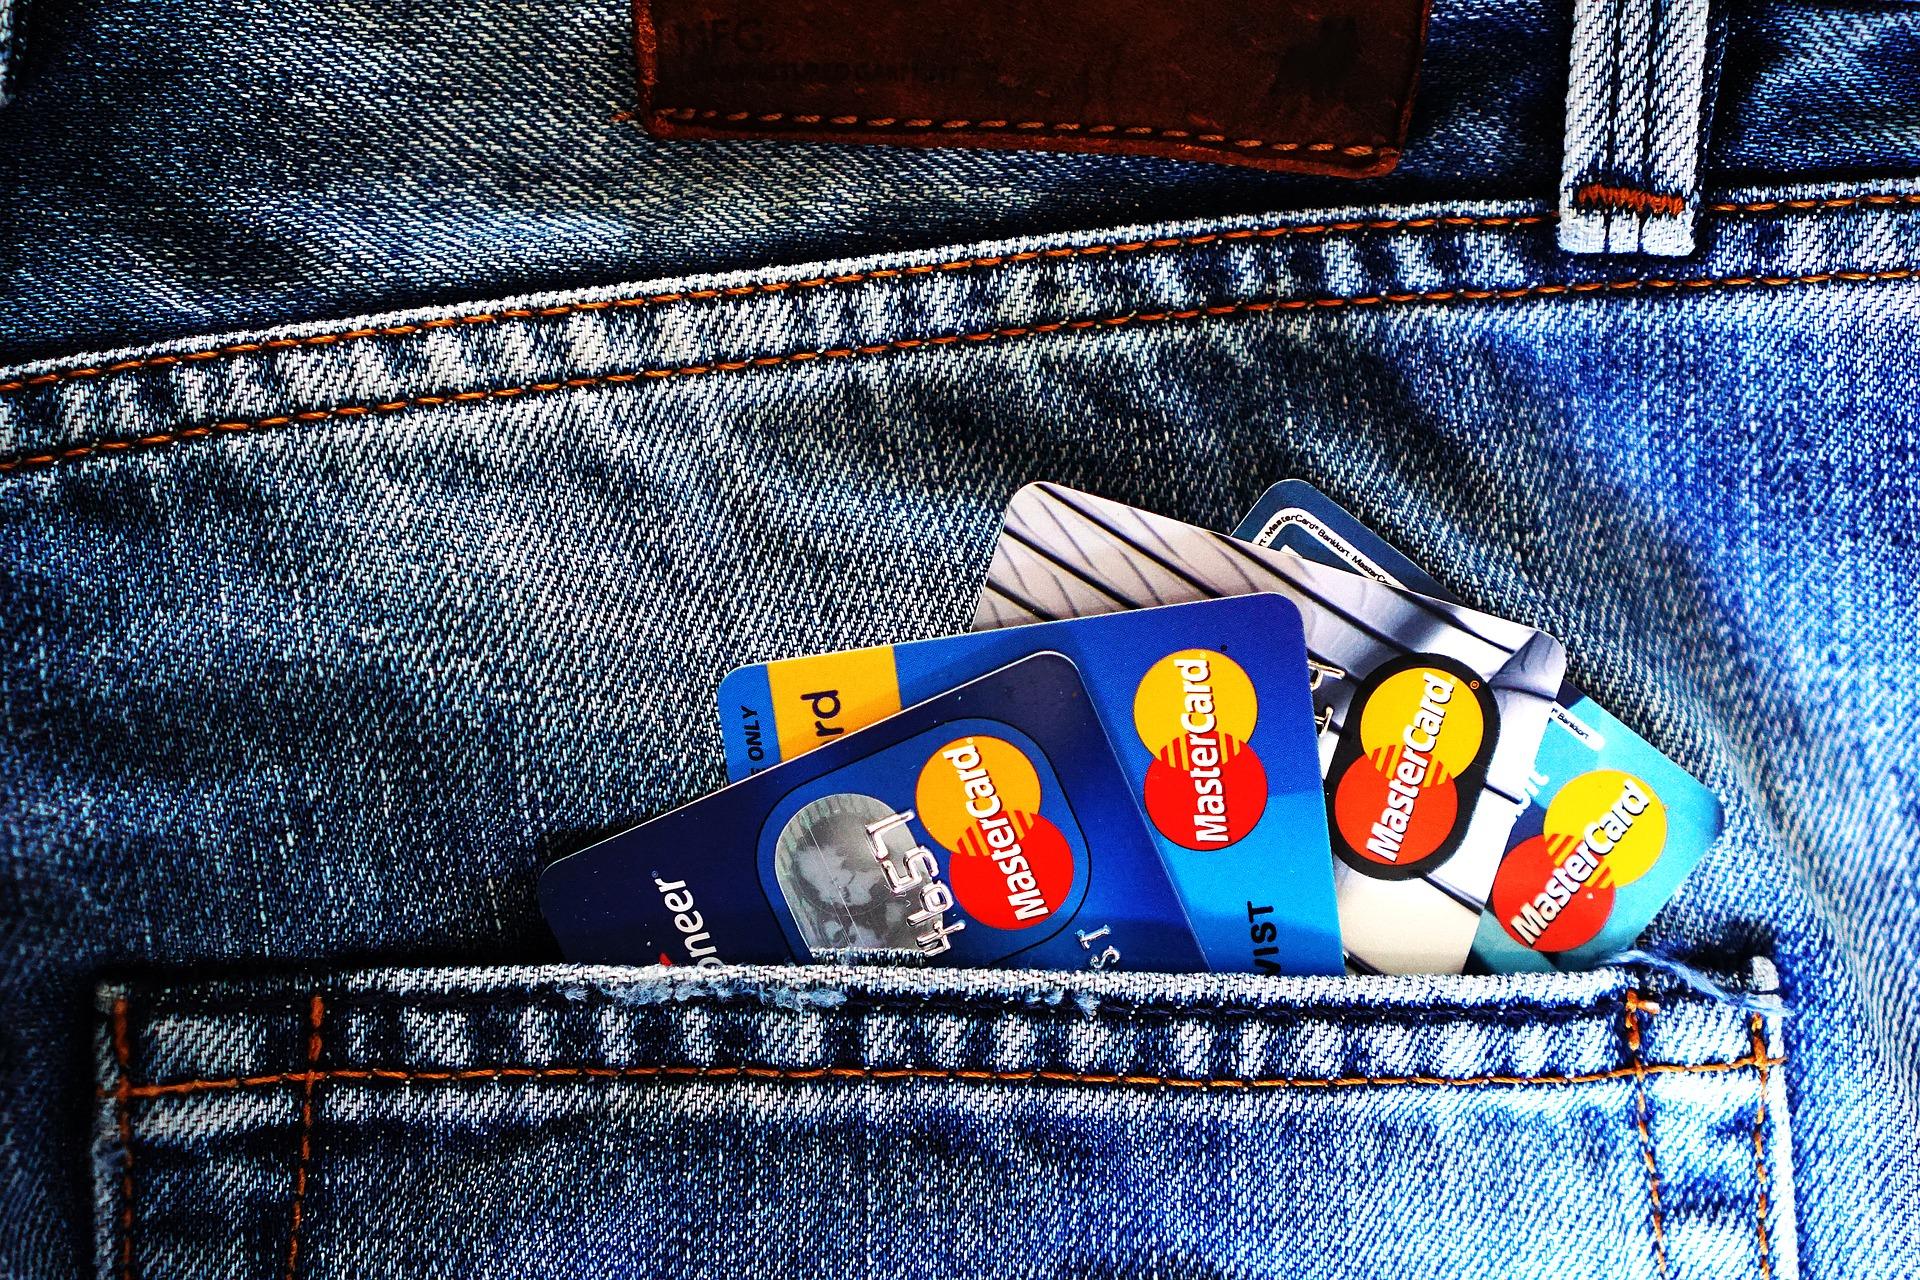 Compte en banque en ligne